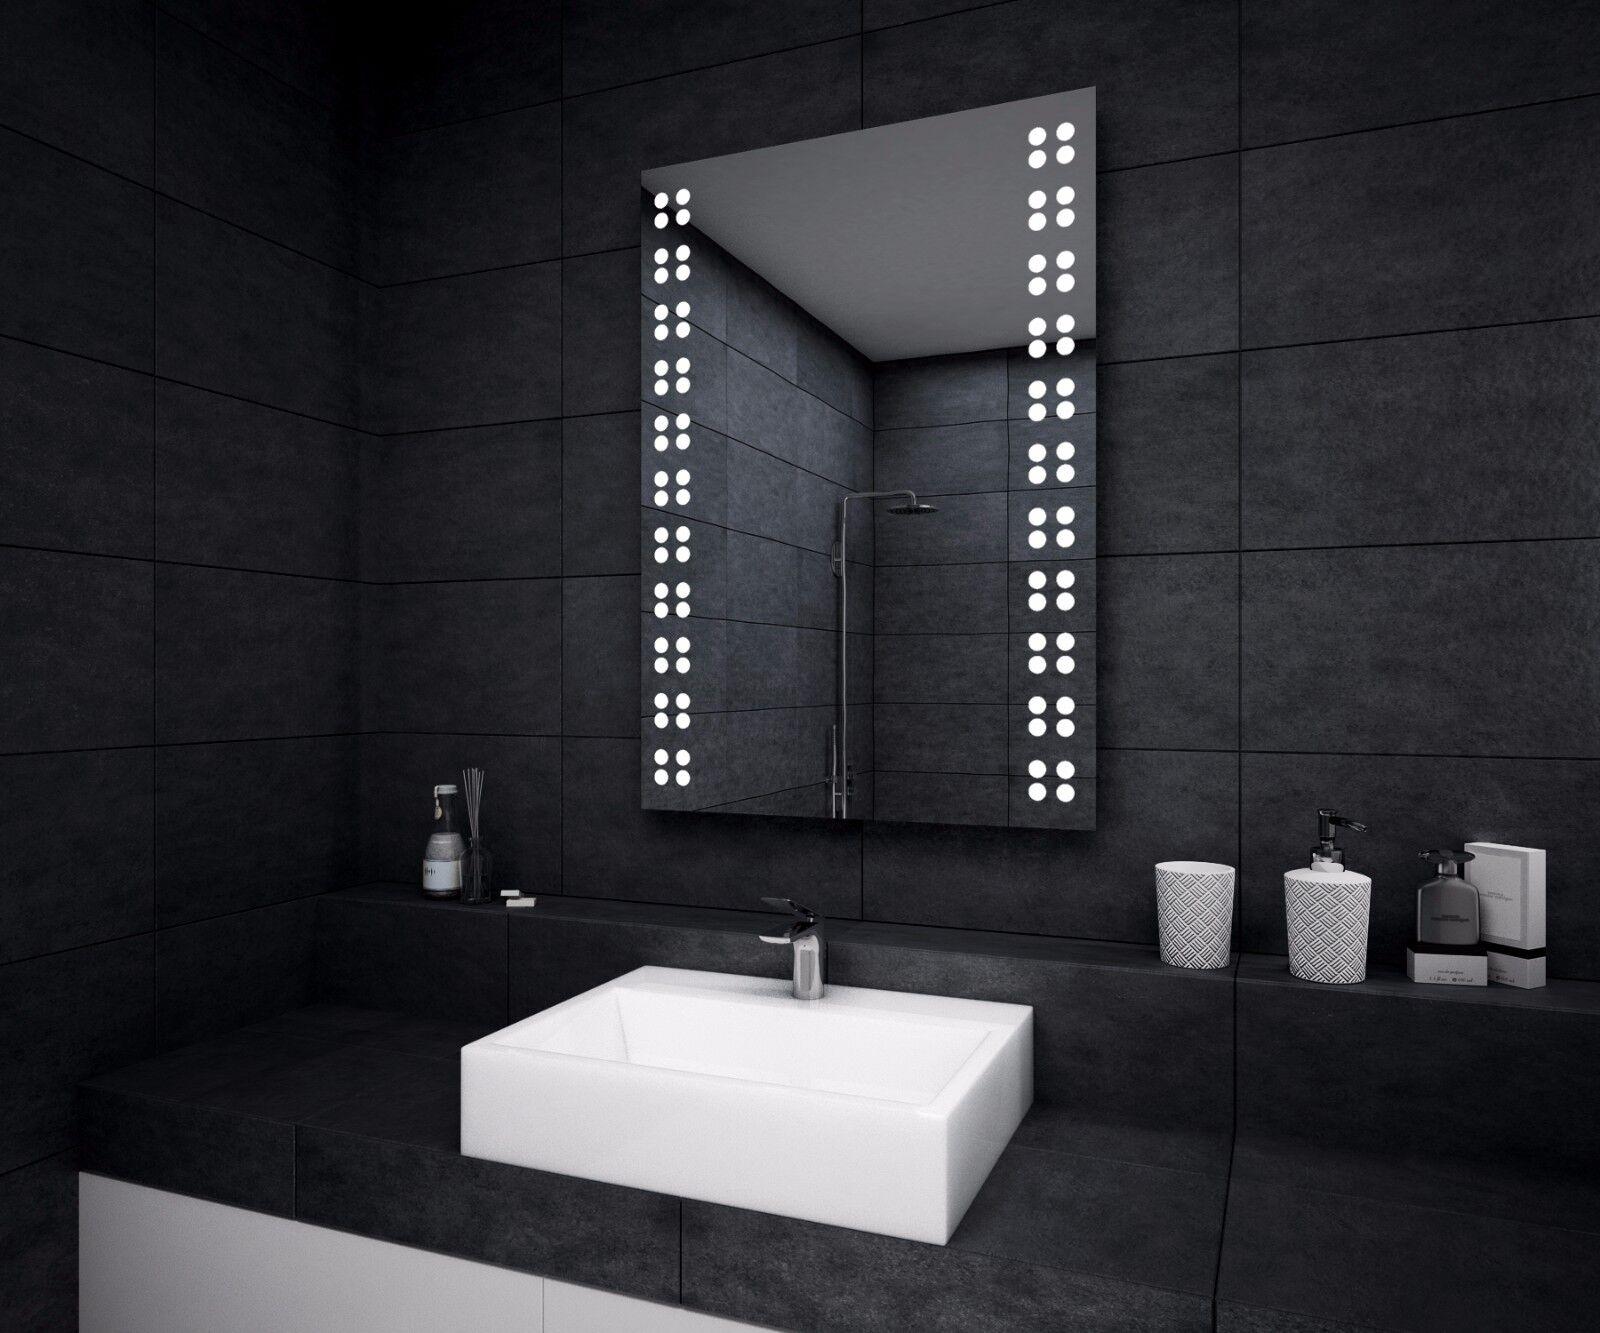 LED ILLUMINATED BATHROOM MIRROR   Demister   Sensor   Shaver